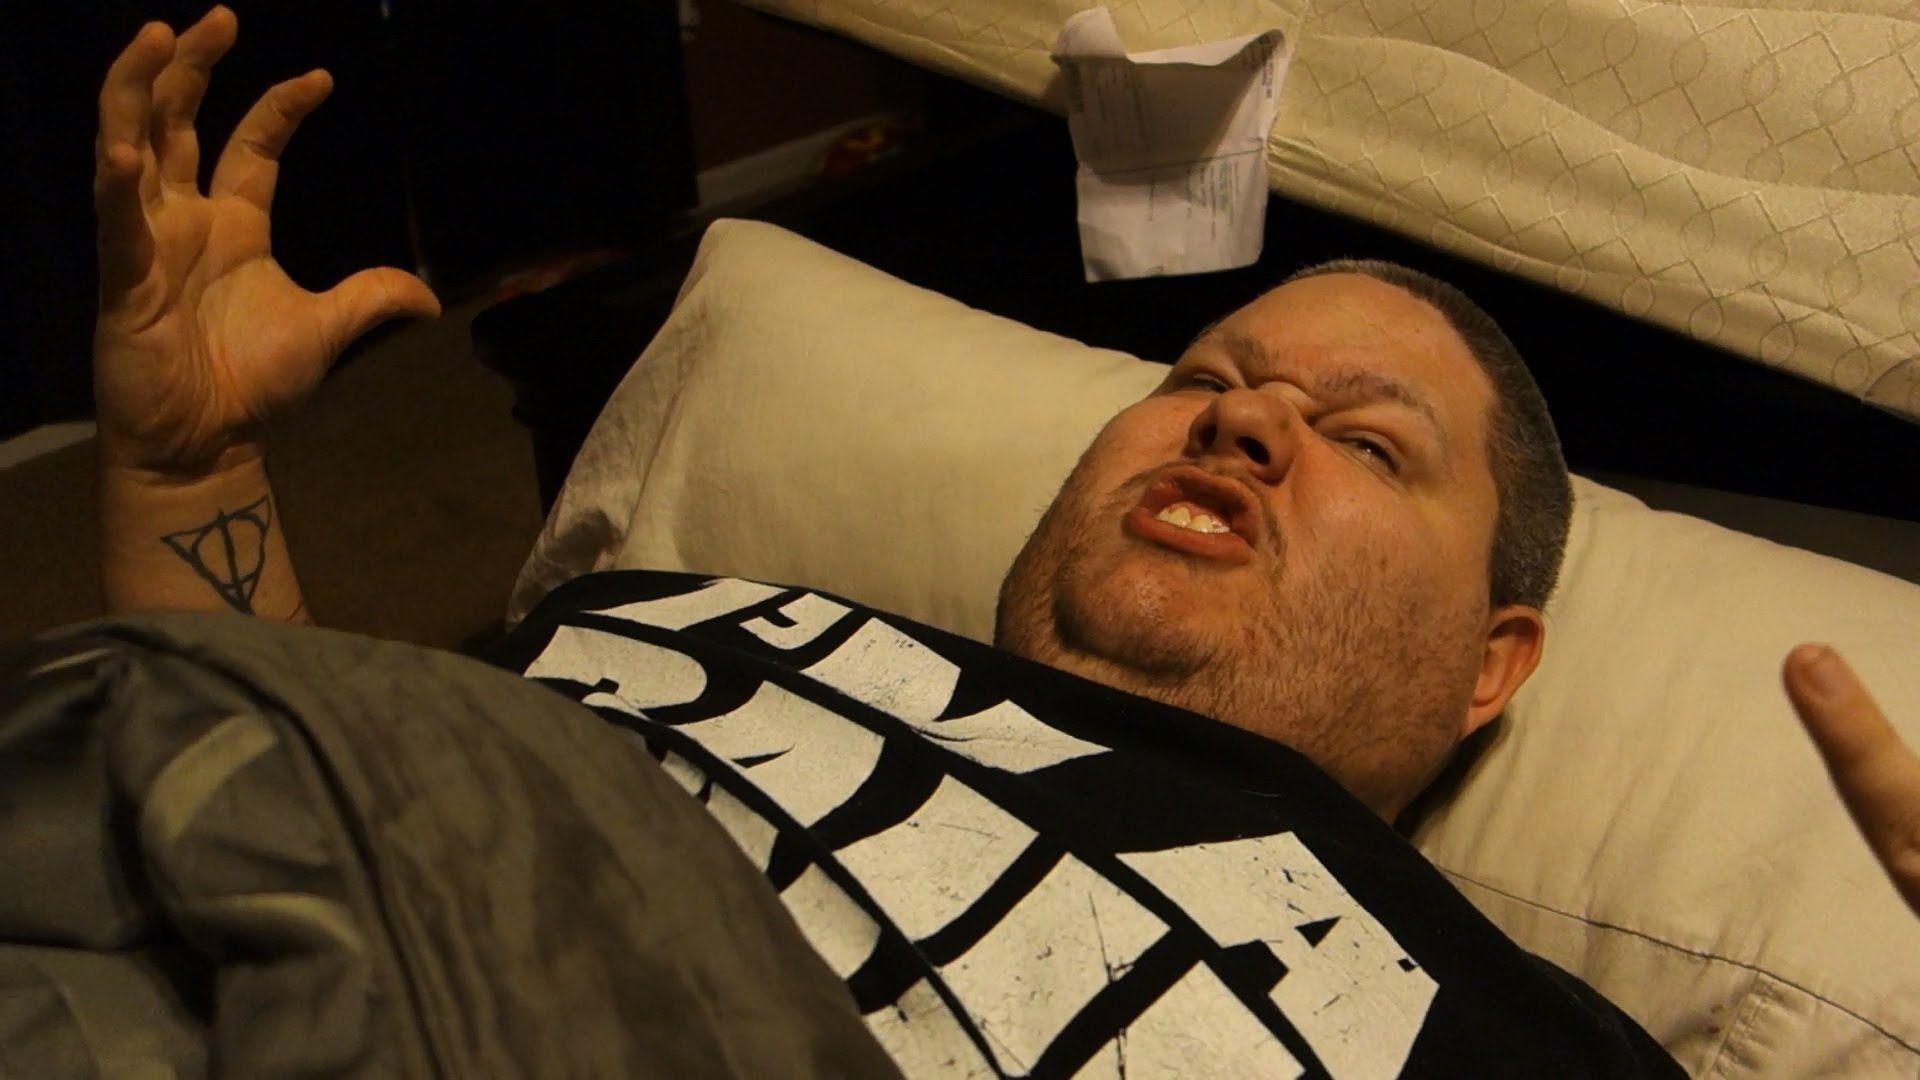 PICKLEBOY'S SICK!! (HALLOWEEN WHOPPER PRANK) | Angry Grandpa ...